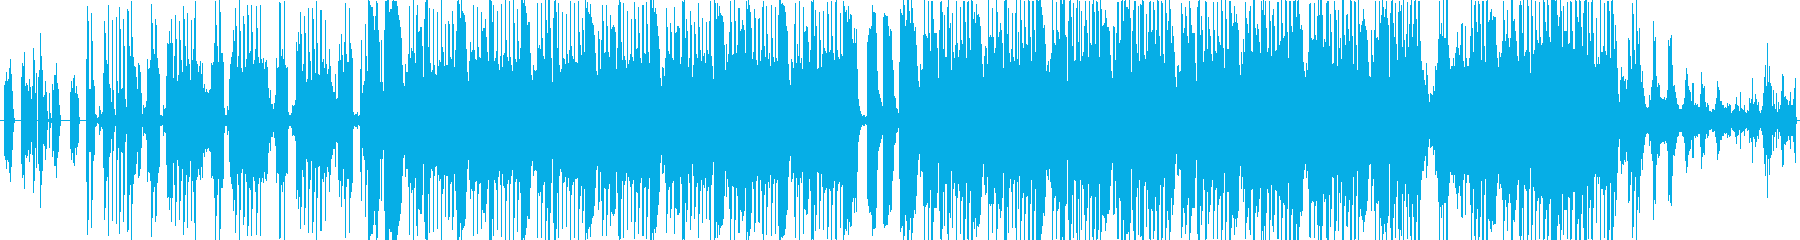 Markの再生済みの波形